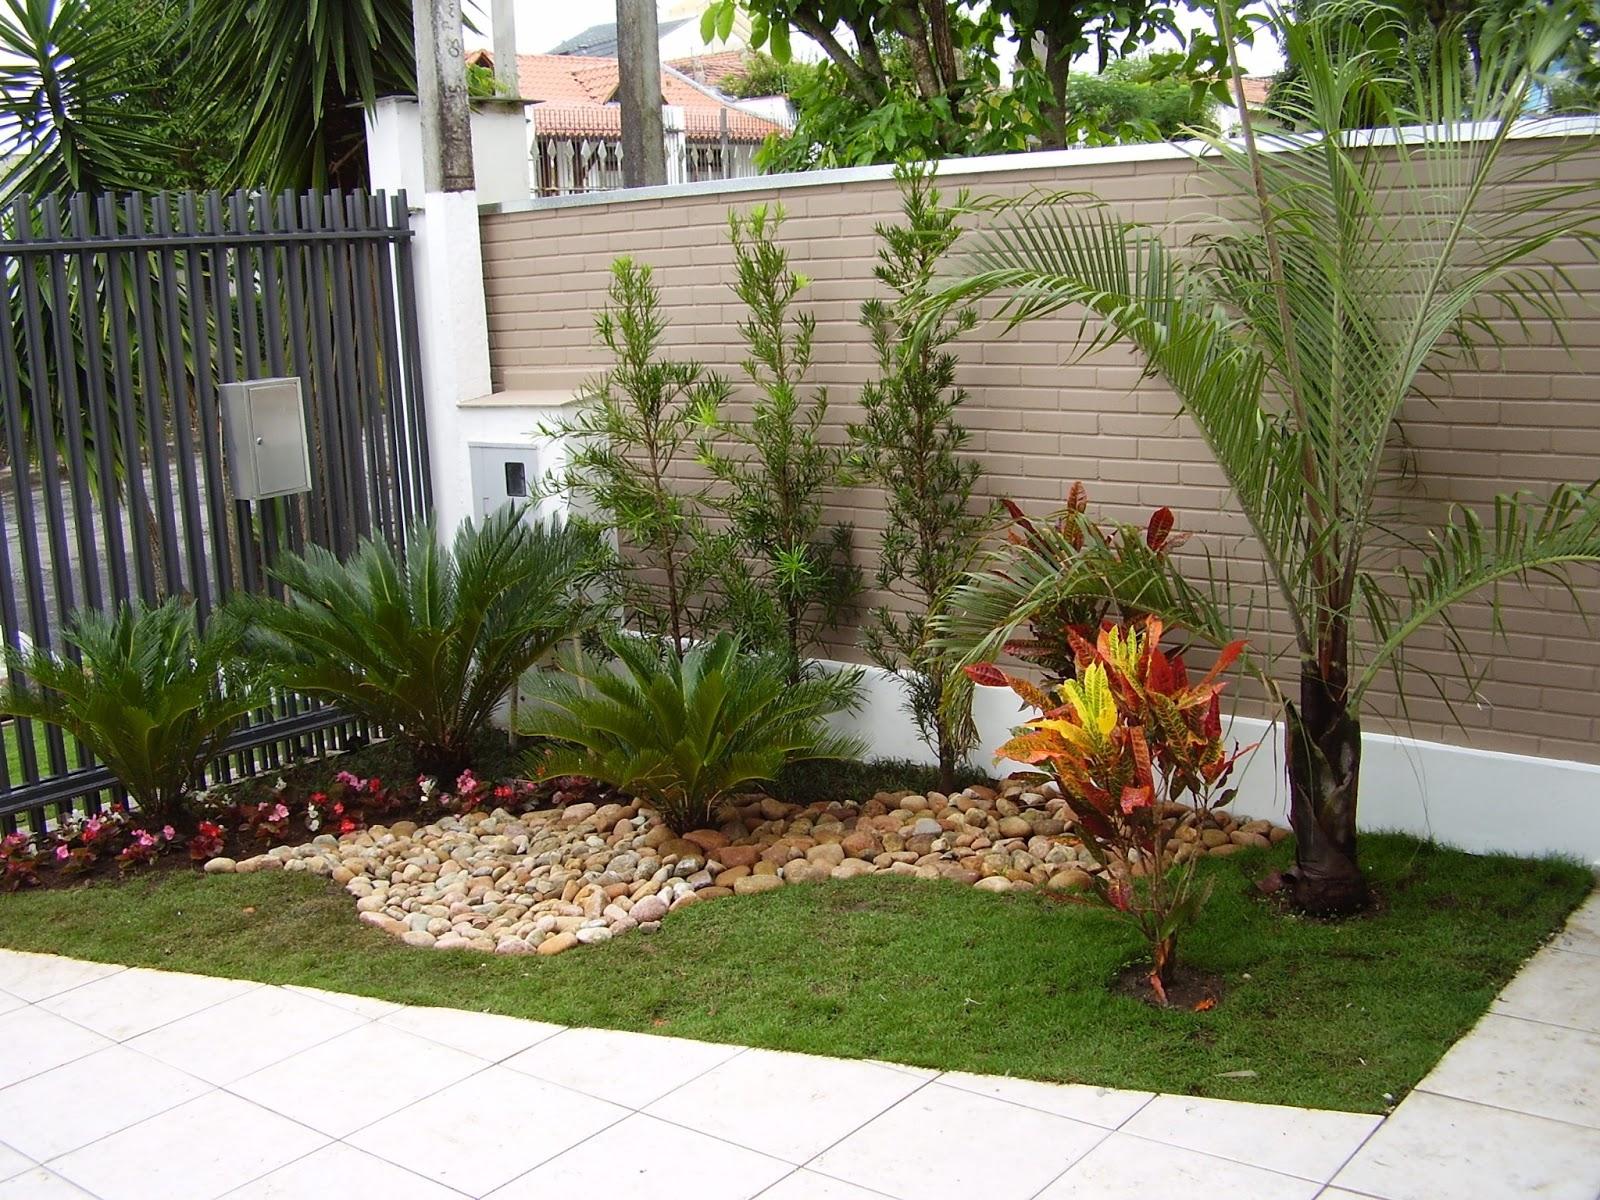 plantas jardim externo : plantas jardim externo:18- Grama, plantas, pedras e flores!!! Amei todas!!